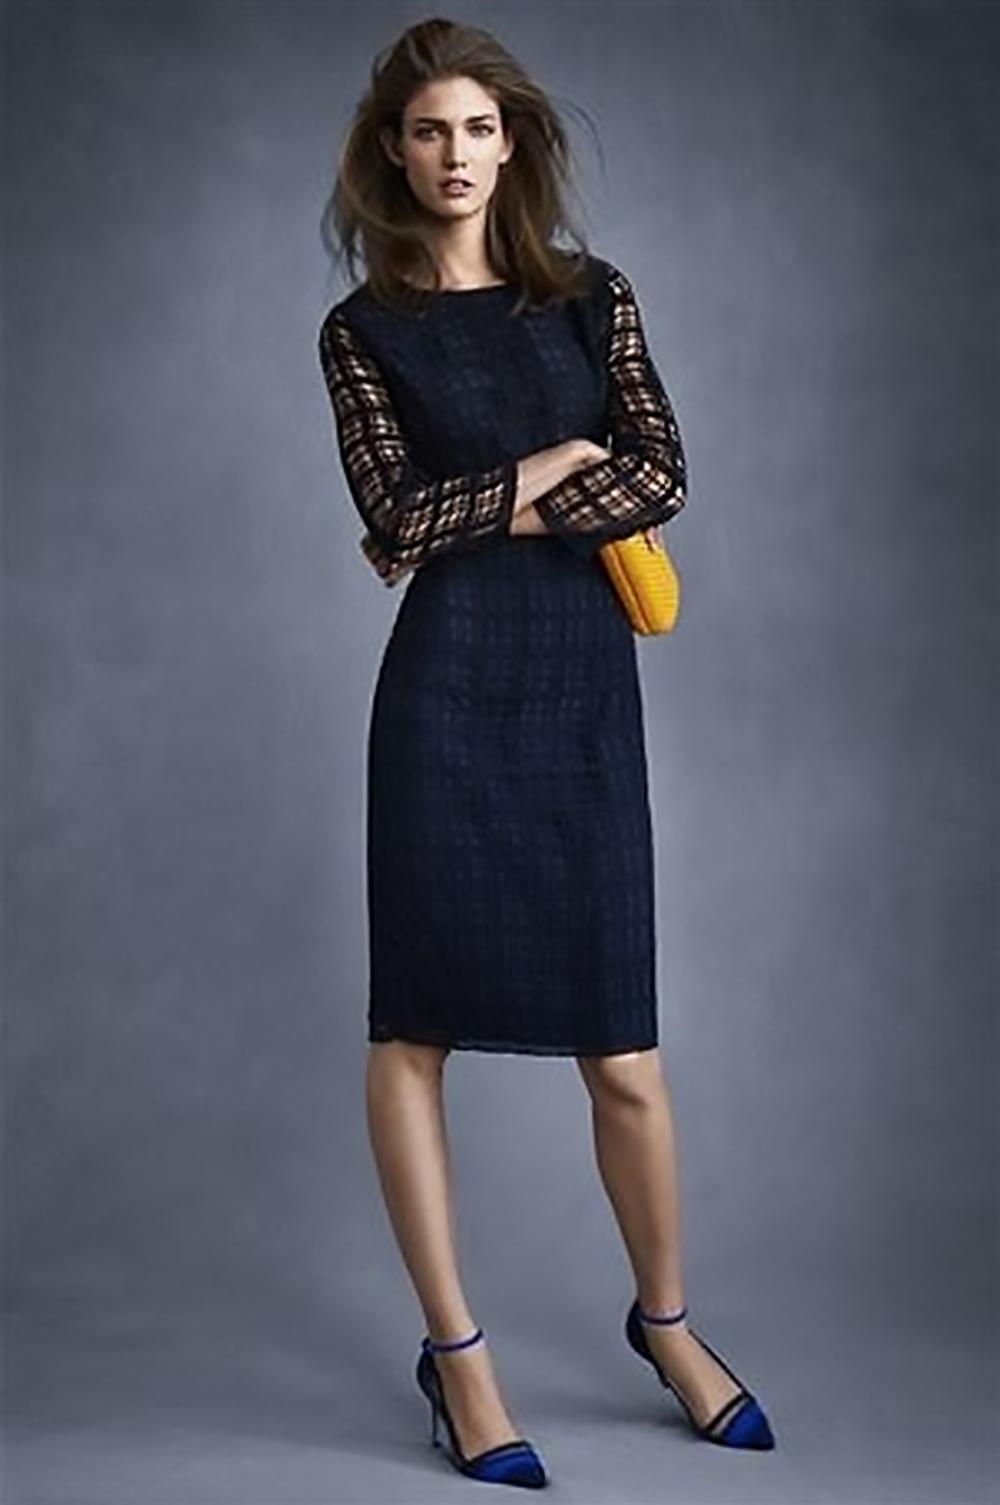 next square lace dress slips 1500.jpg